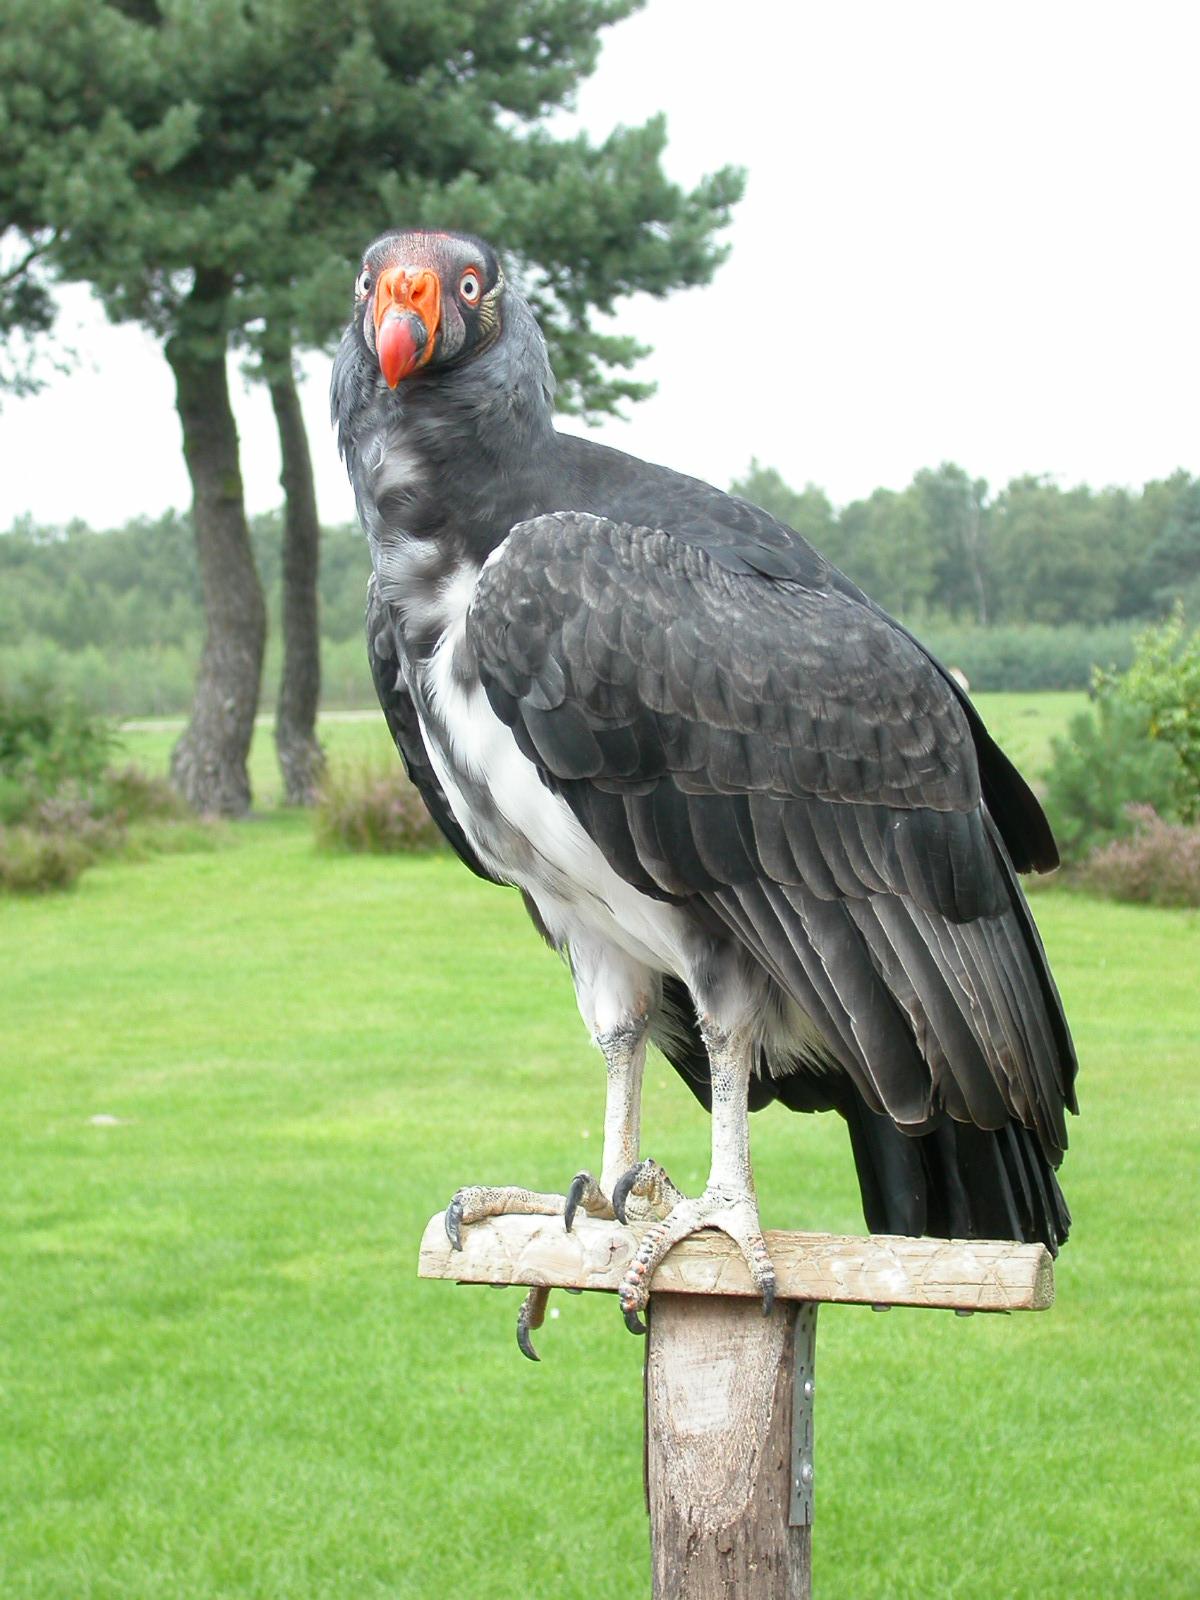 eva bird of prey grey gray feathers beak vulture claws